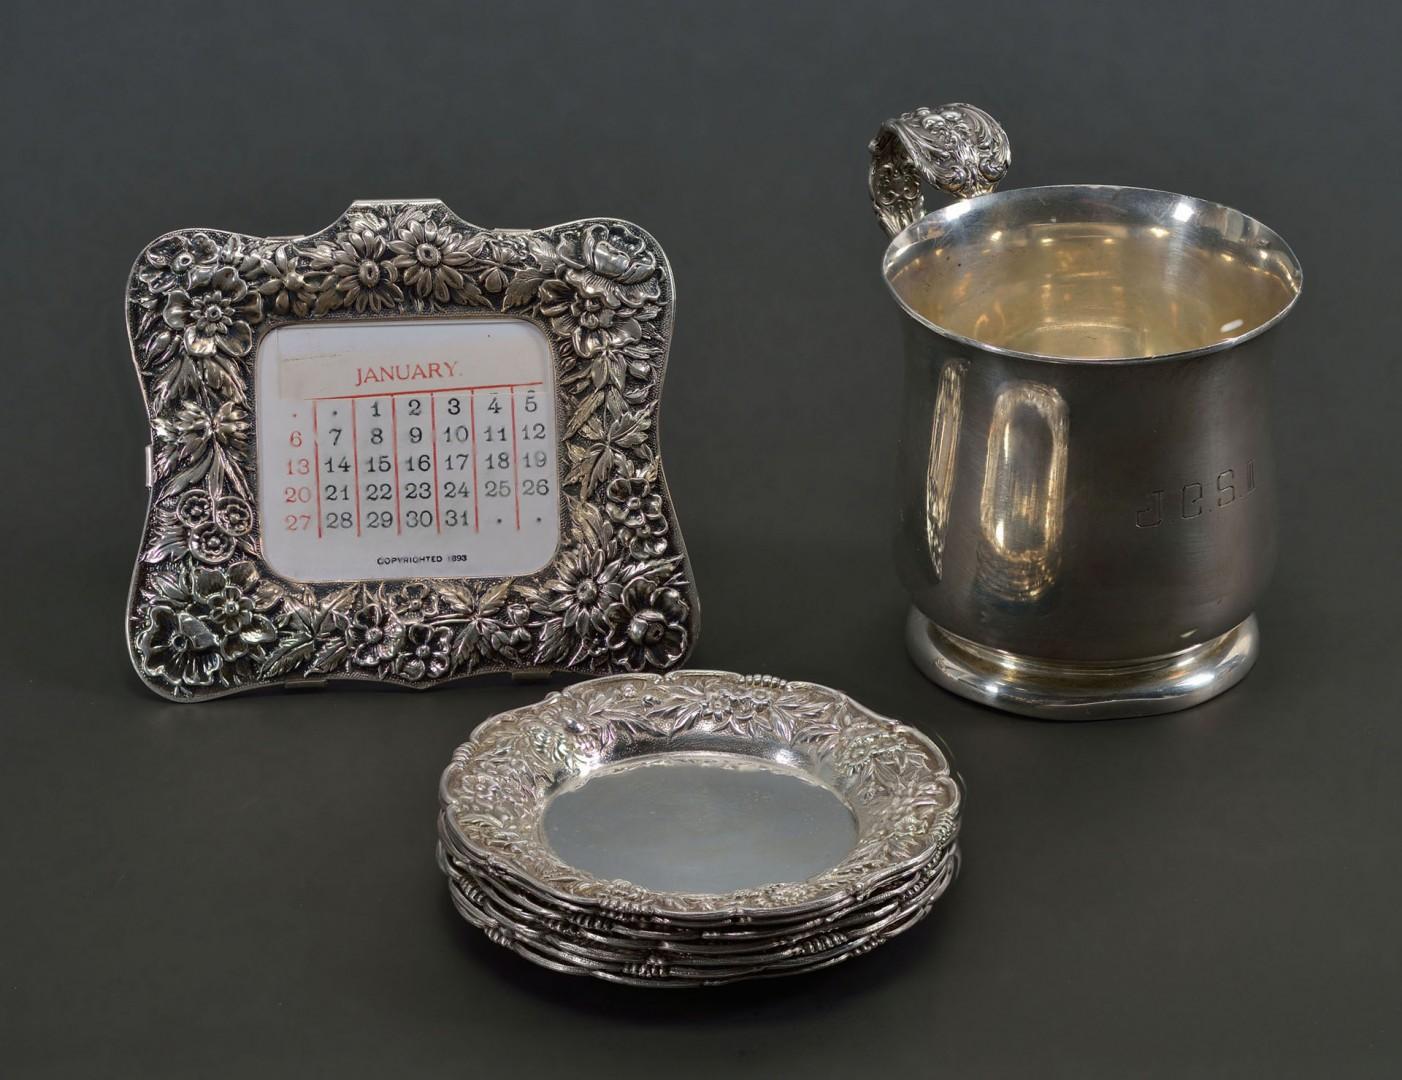 Lot 302: Kirk Repousse Butter Pats & Calendar, Francis I Cu